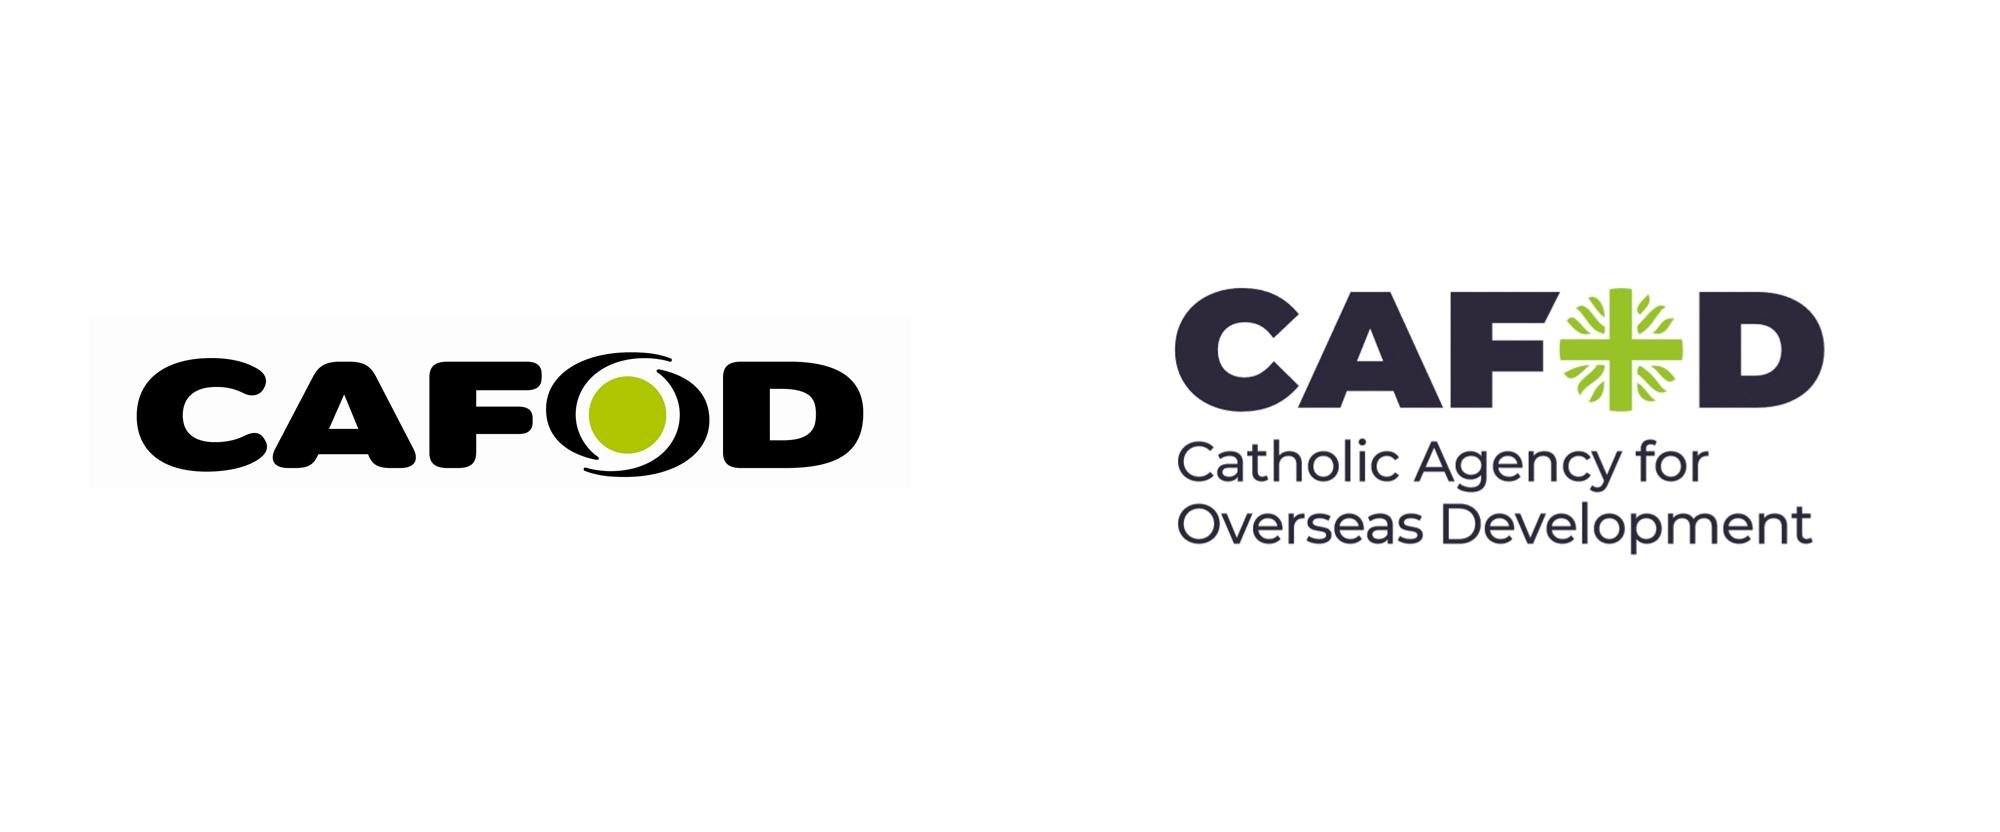 New Logo for CAFOD